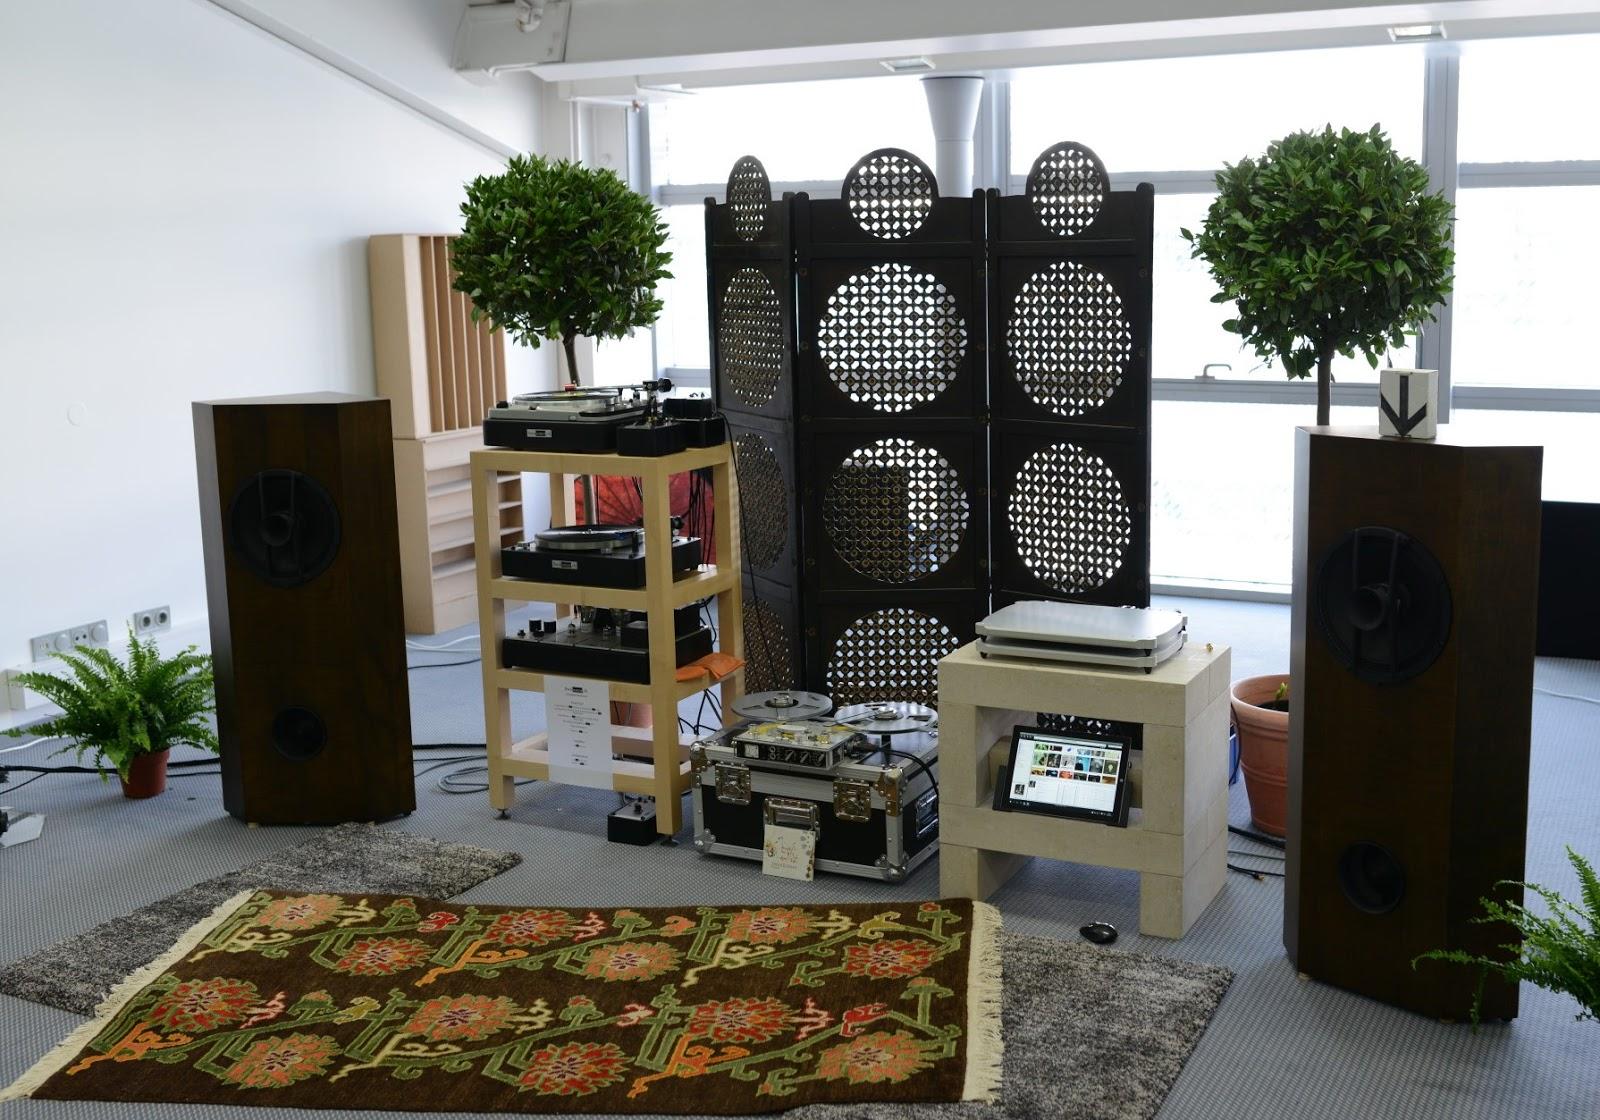 la magia del vinilo de nuevo swissonor en munich. Black Bedroom Furniture Sets. Home Design Ideas